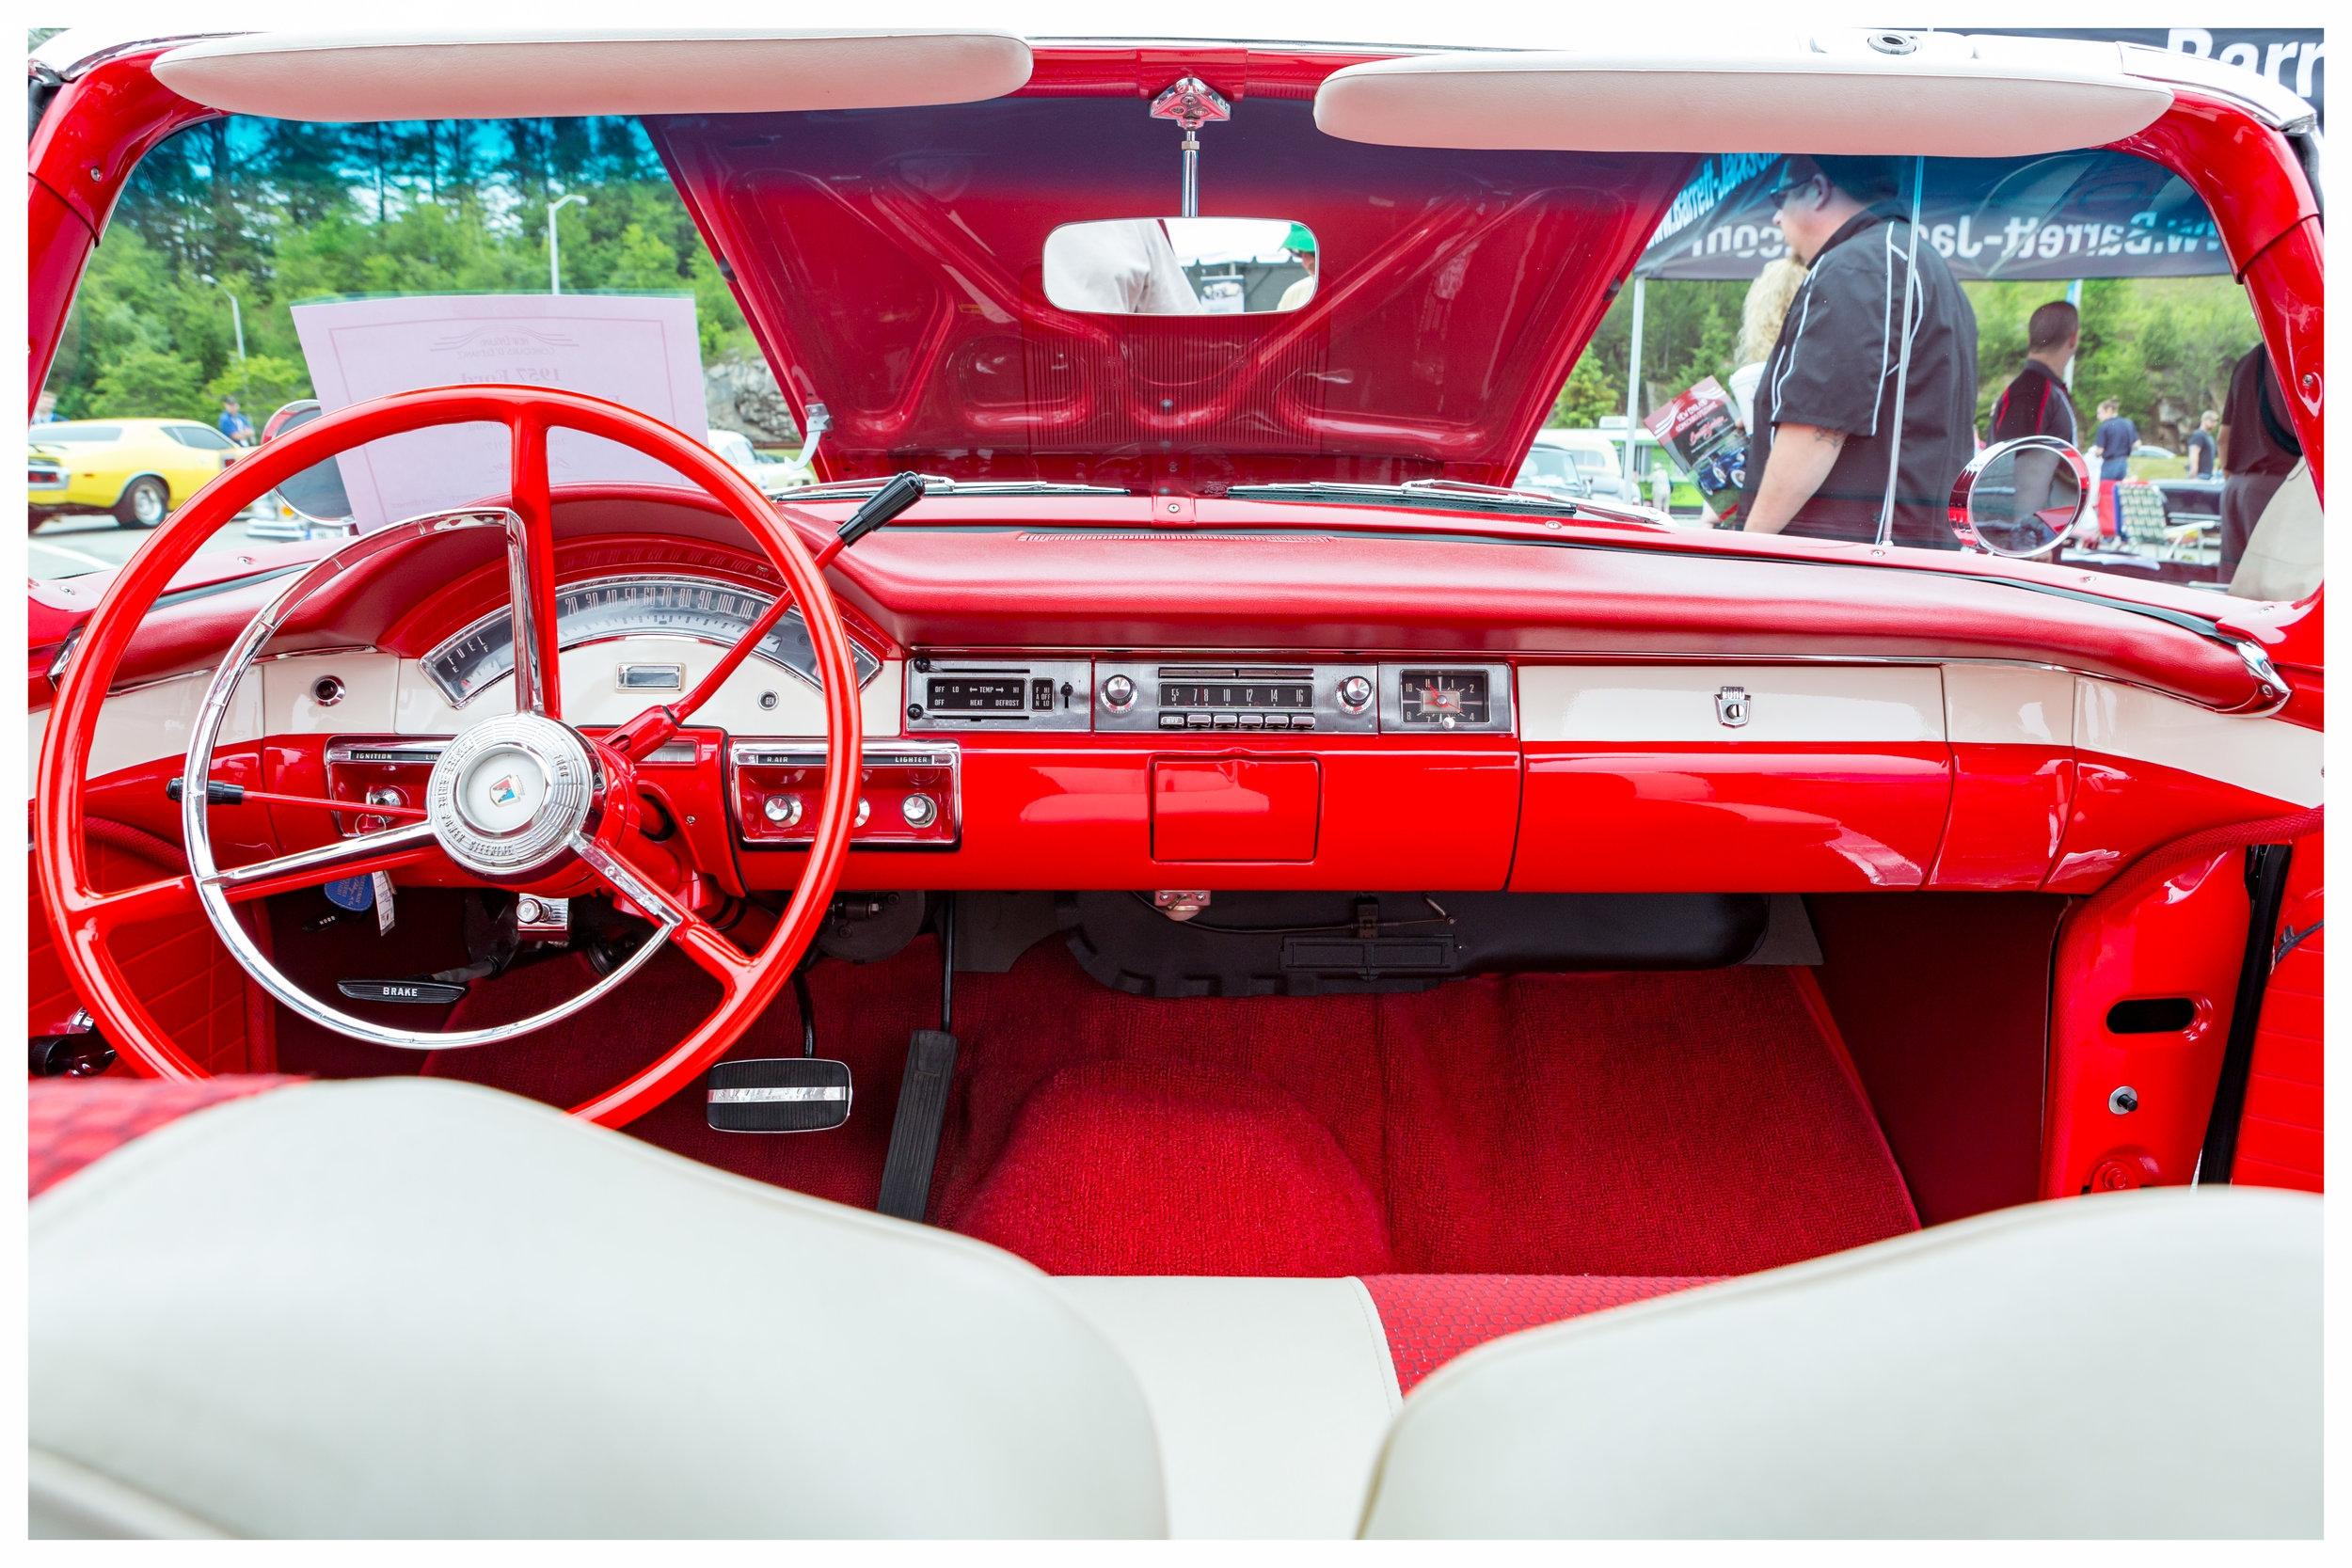 Barrett Jackson Car Show-19.jpg